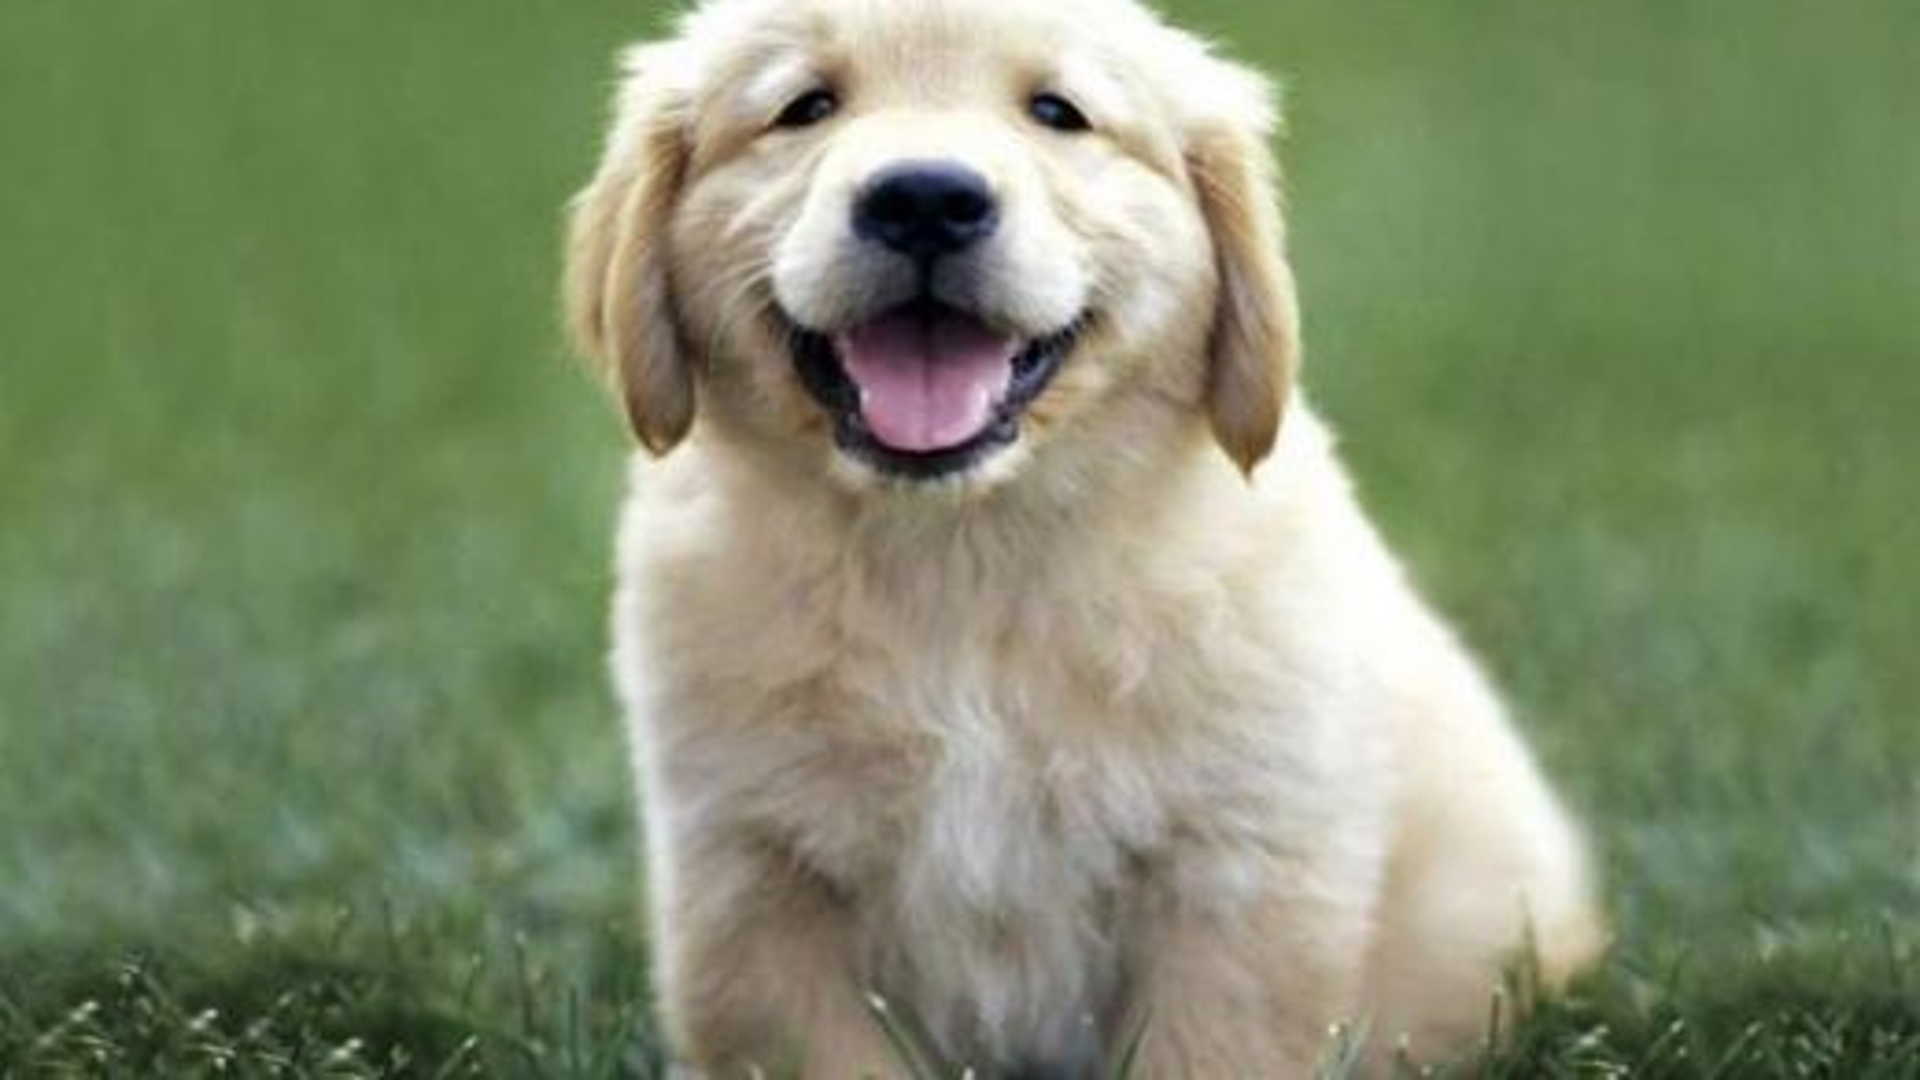 سگ | تگ